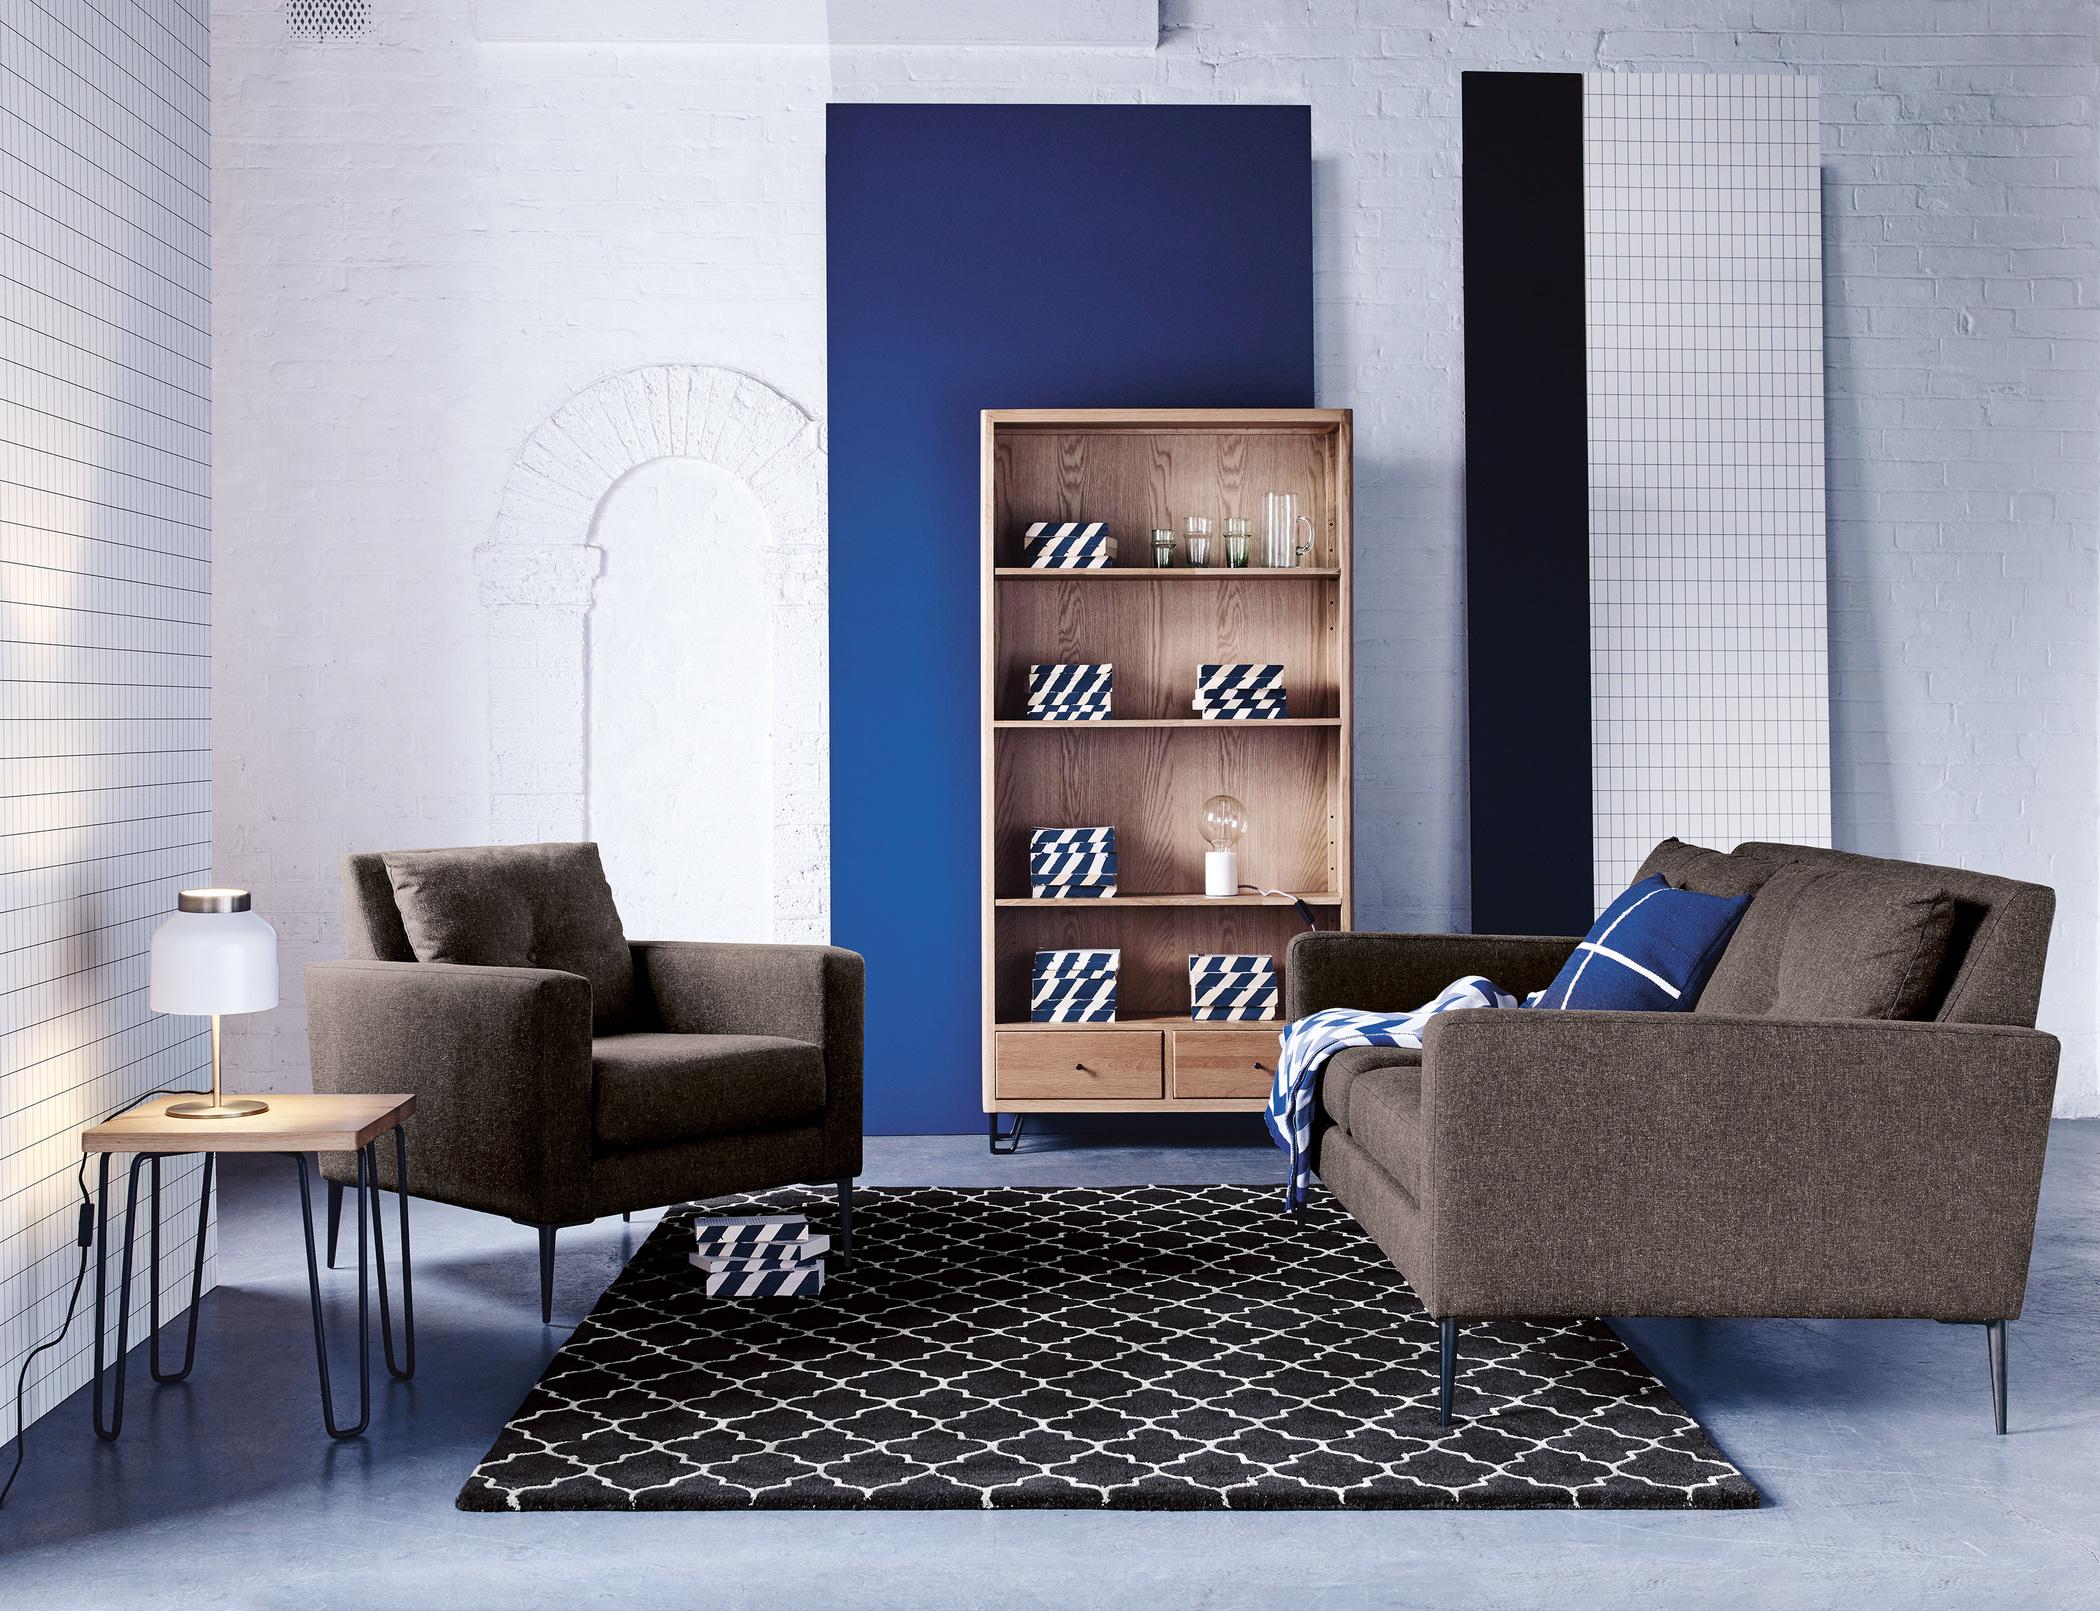 brunel-sofa-perfect-sofa-for-small-home